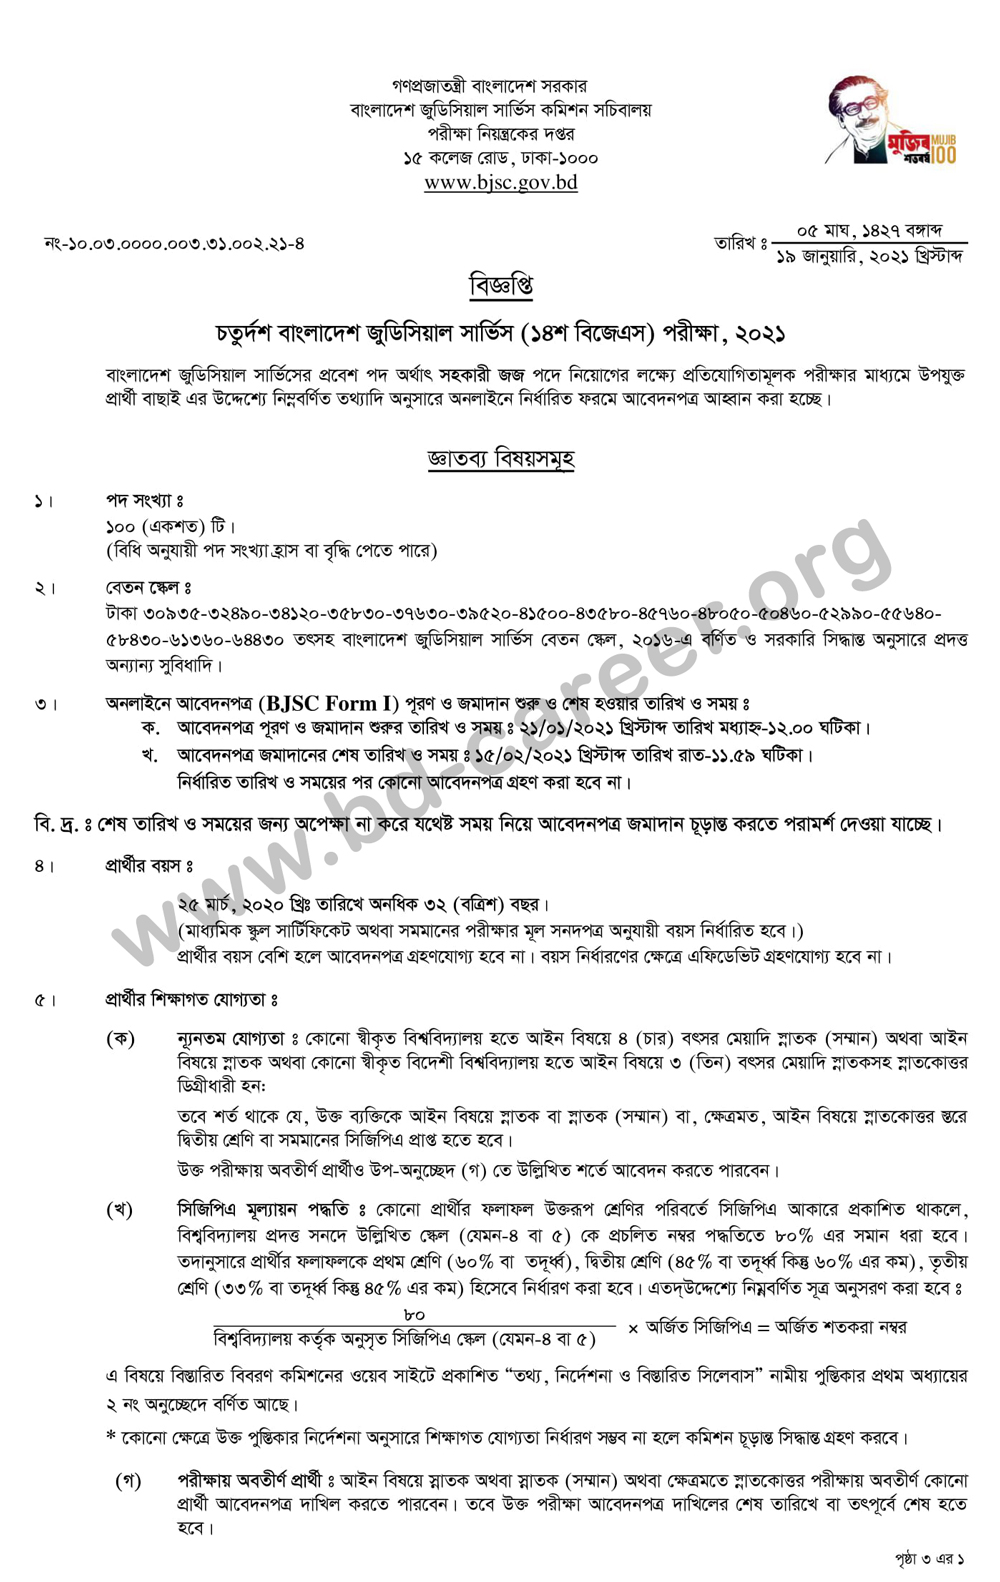 14th BJSC Exam Circular 2021